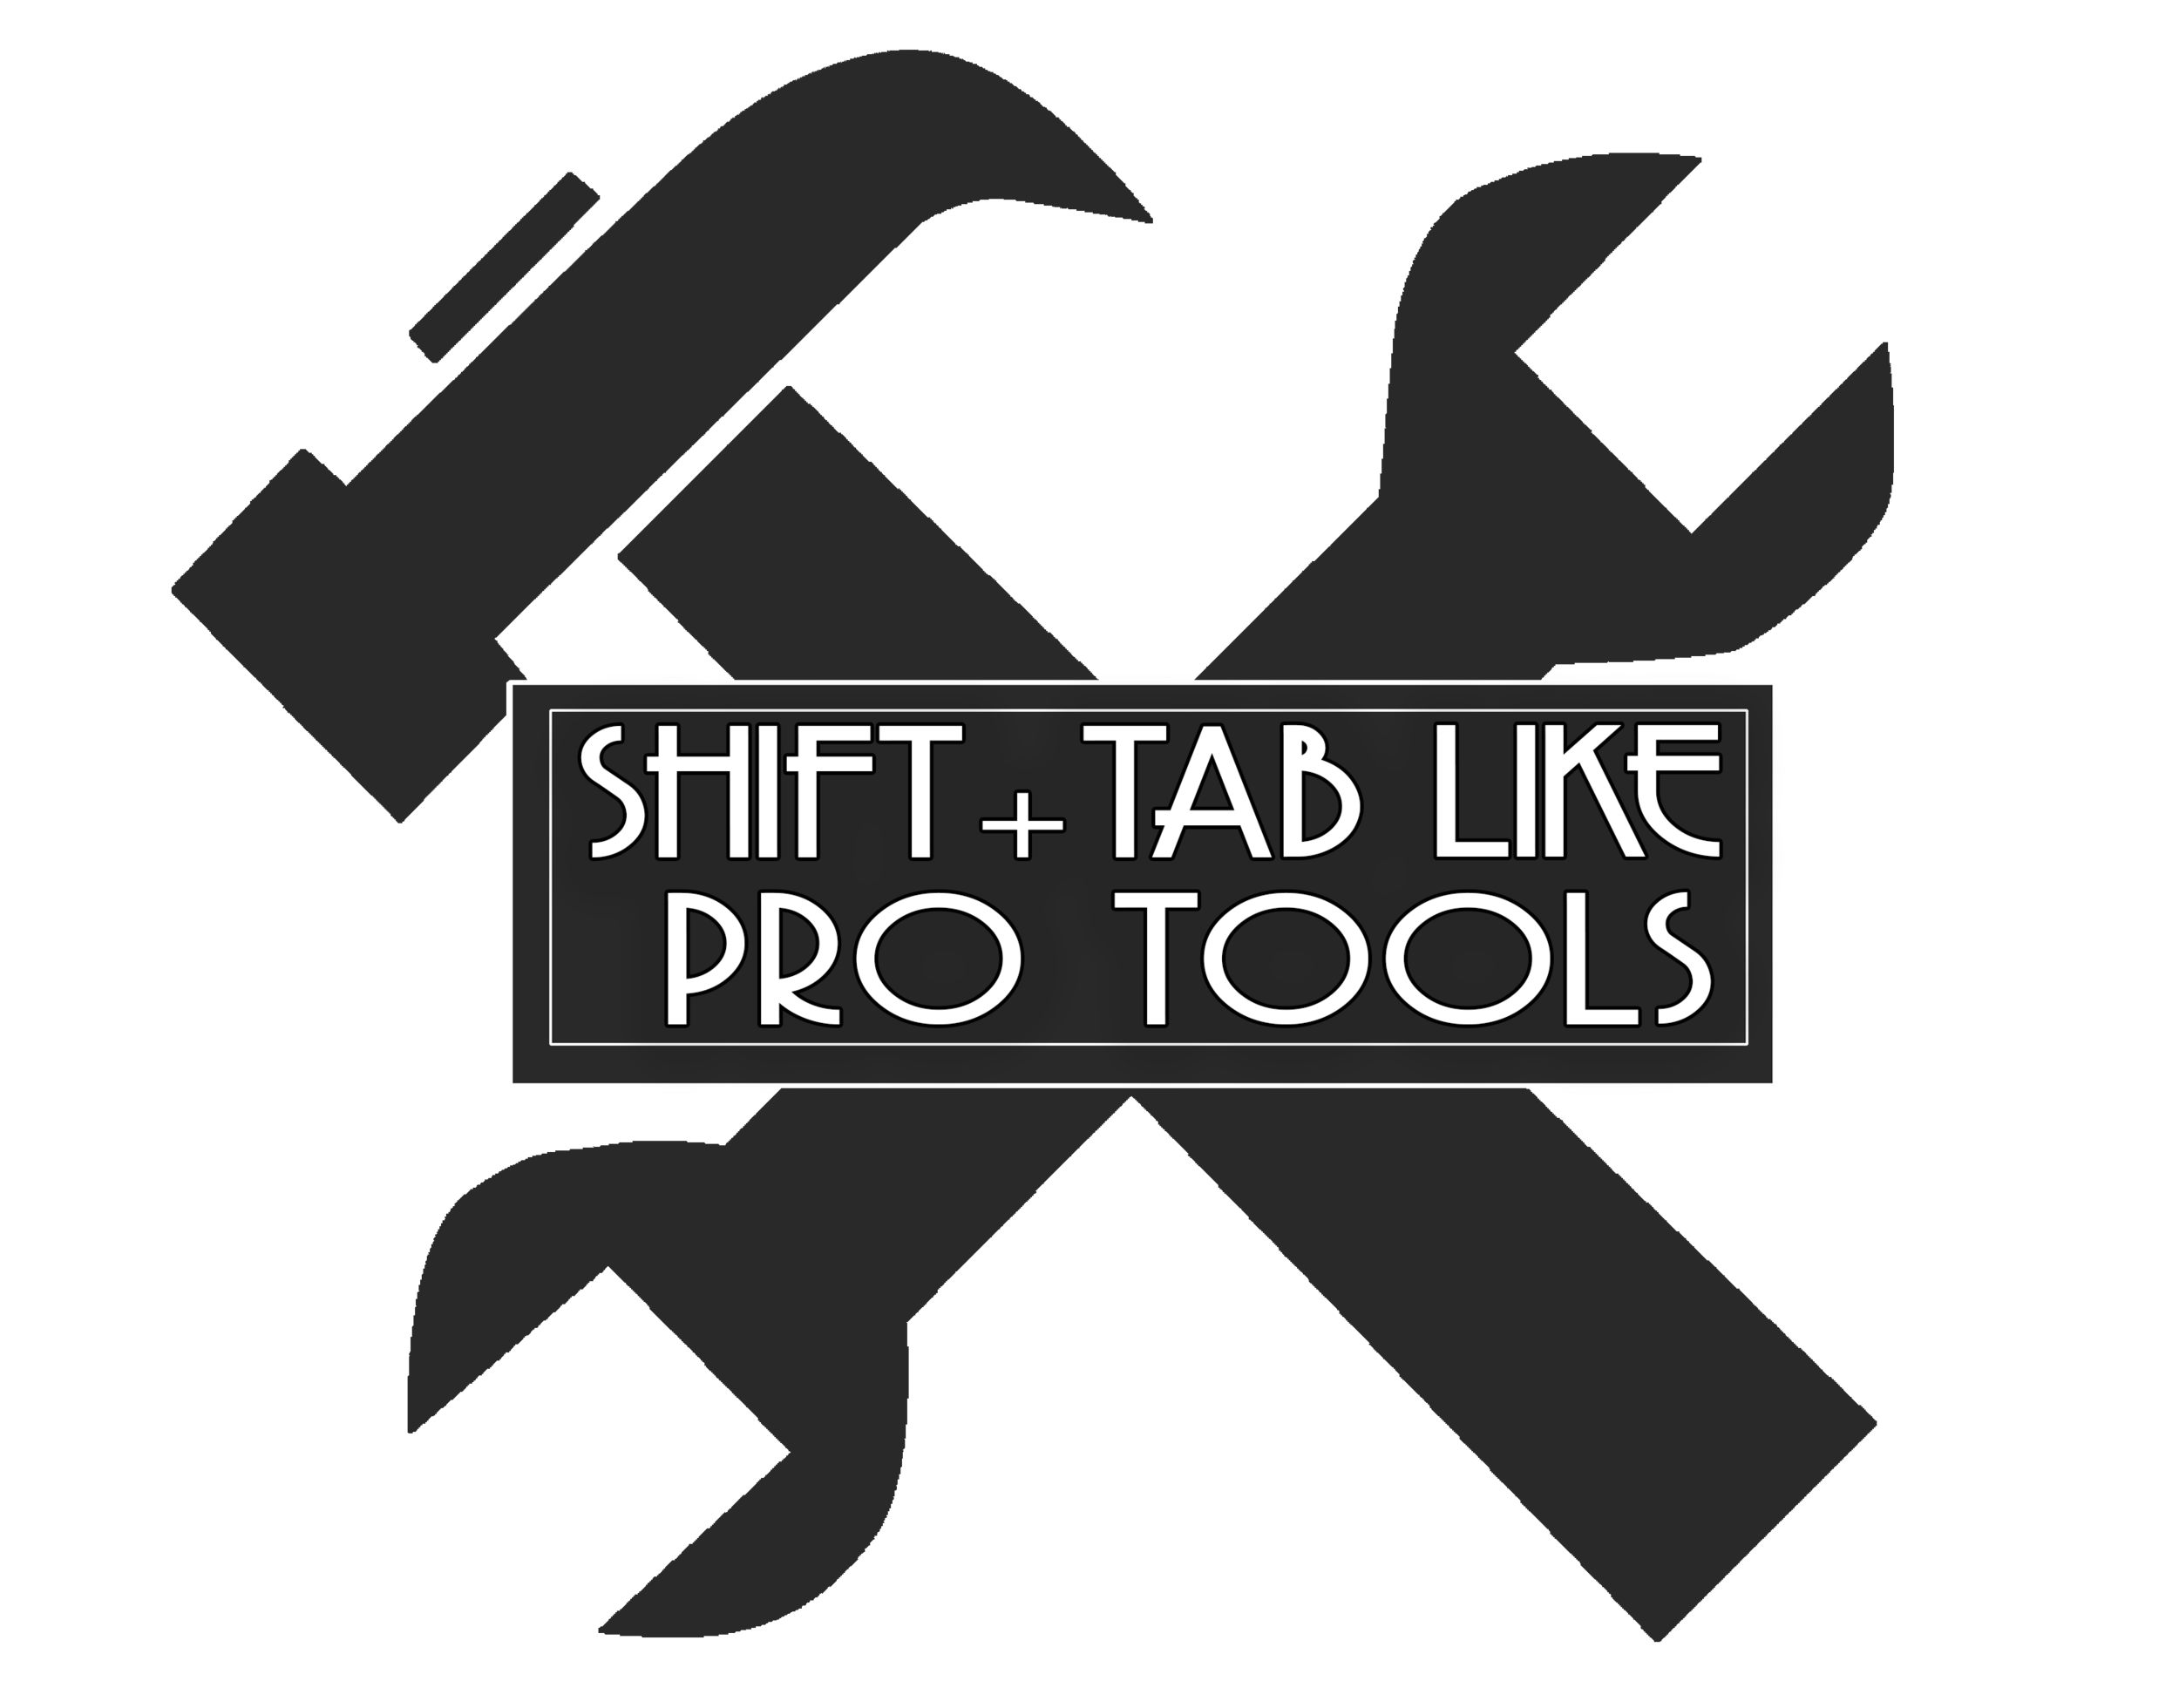 shift+tab.png